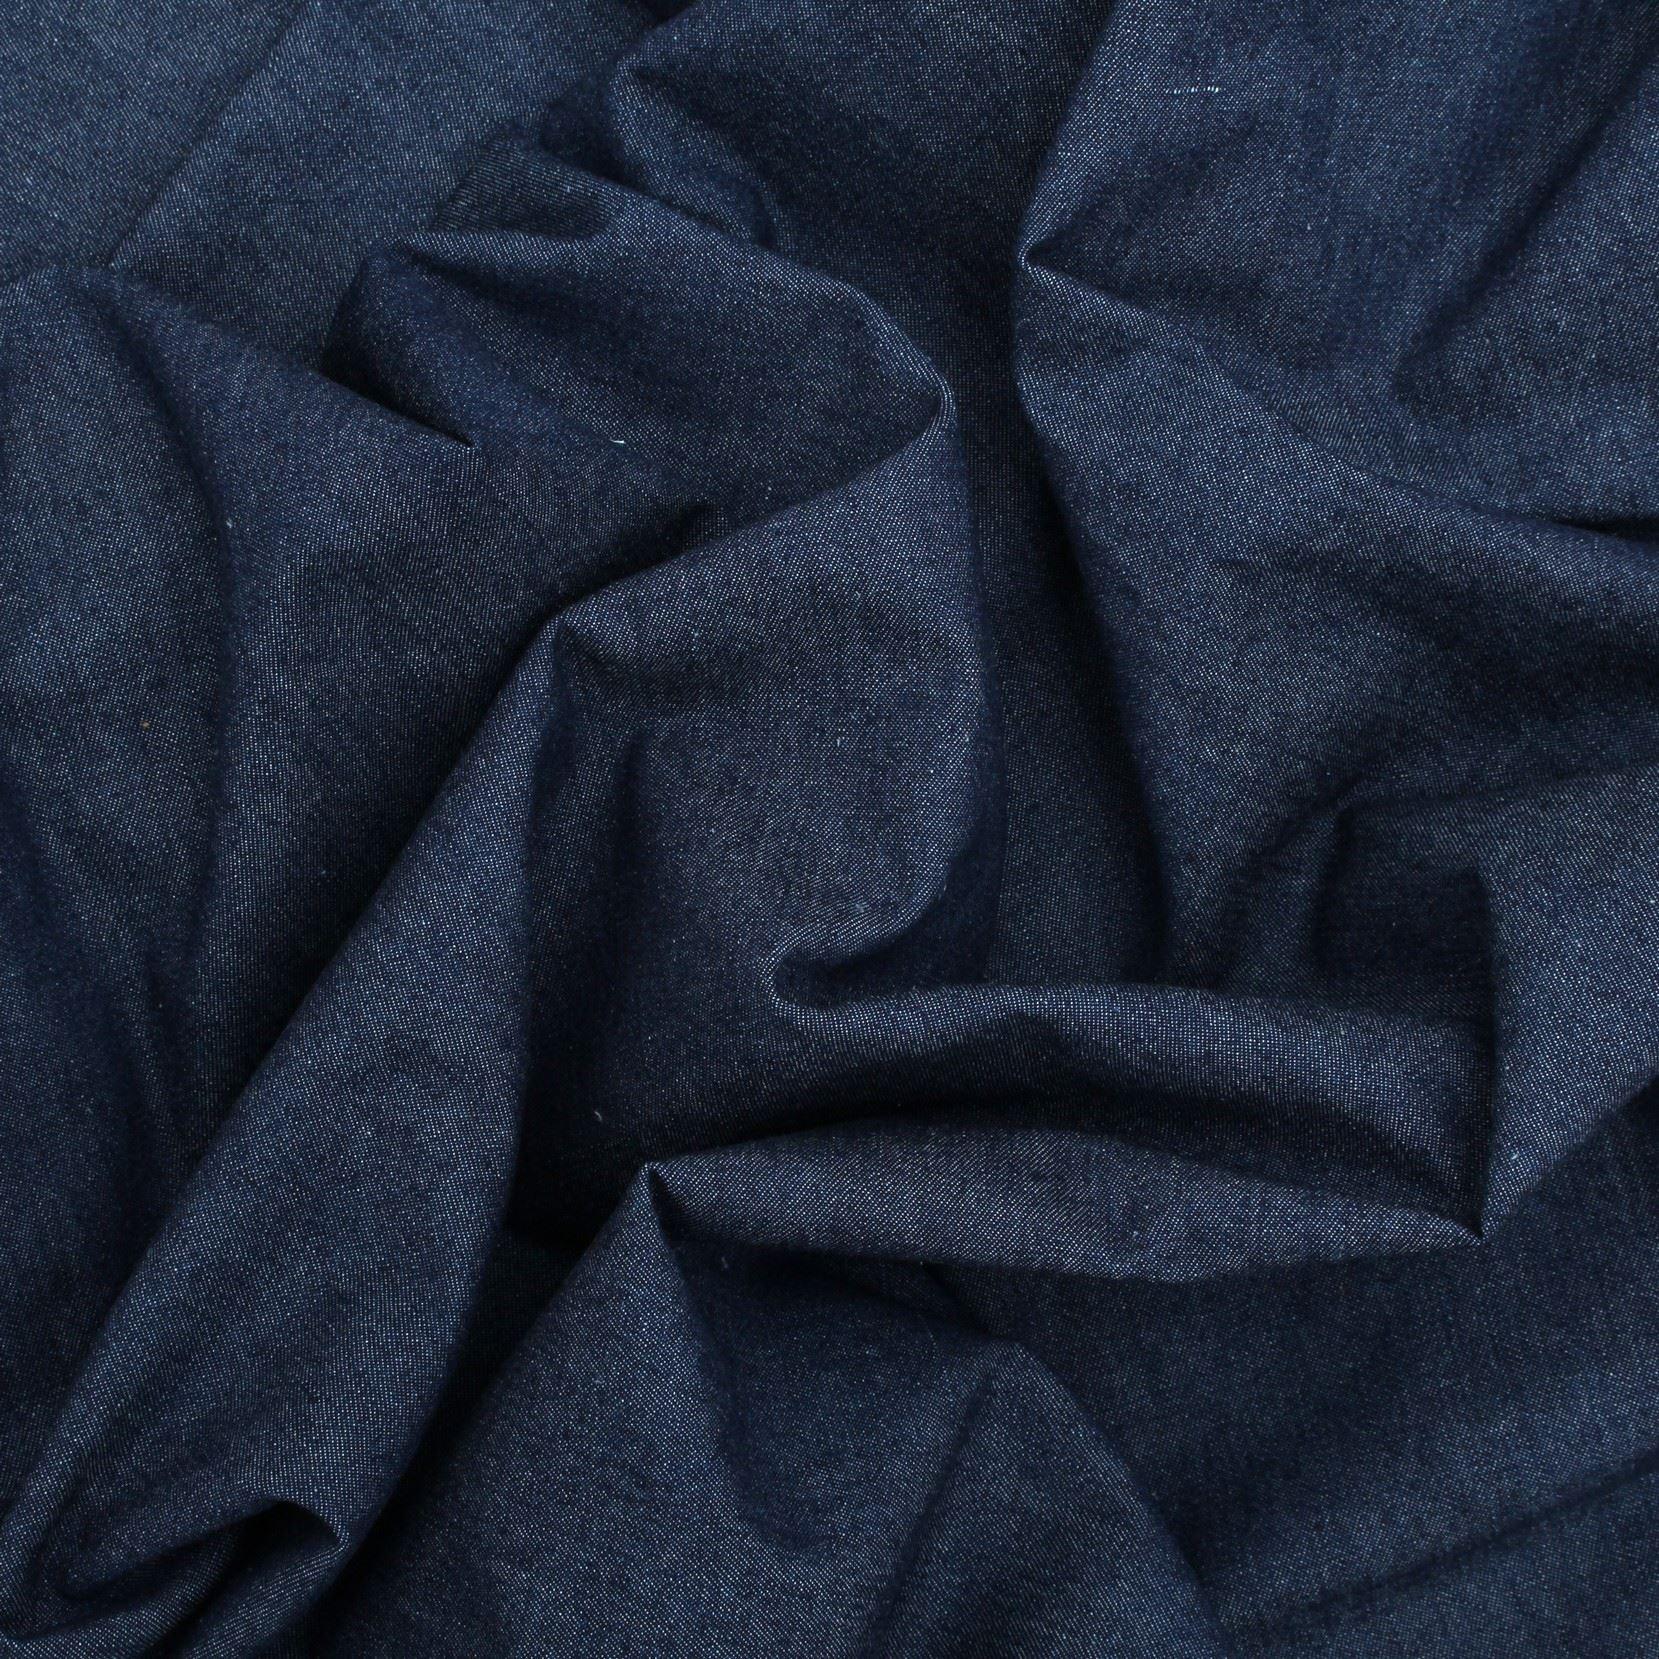 thumbnail 8 - 100% COTTON HEAVYWEIGHT WASHED DENIM CRAFT CLOTHING DRESS SEWING FABRIC